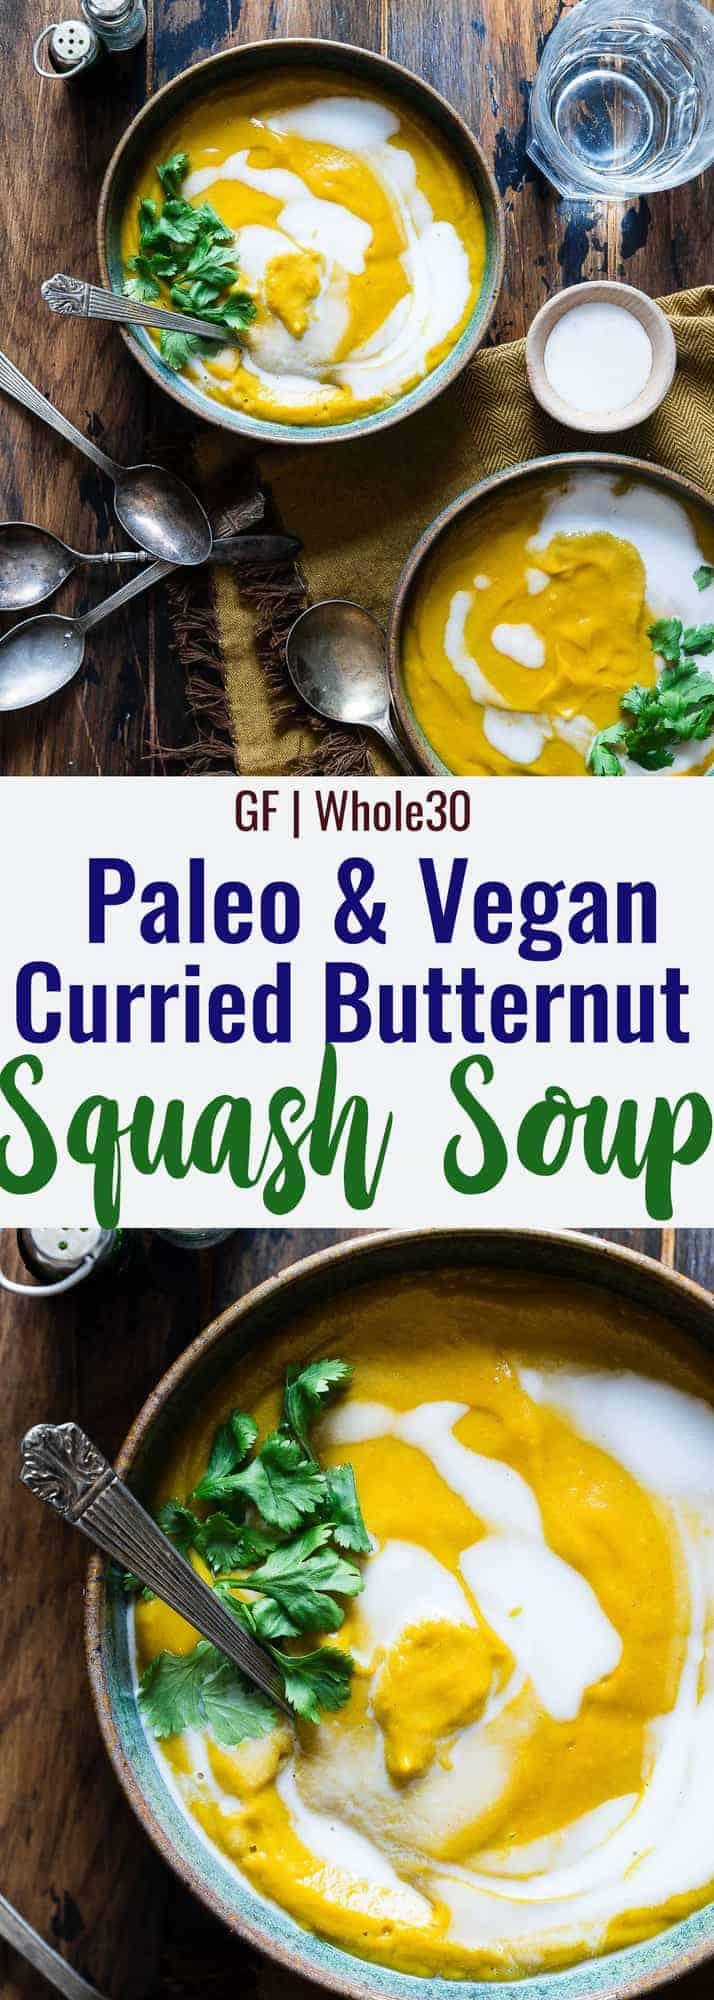 Paleo Butternut Squash Soup collage photo